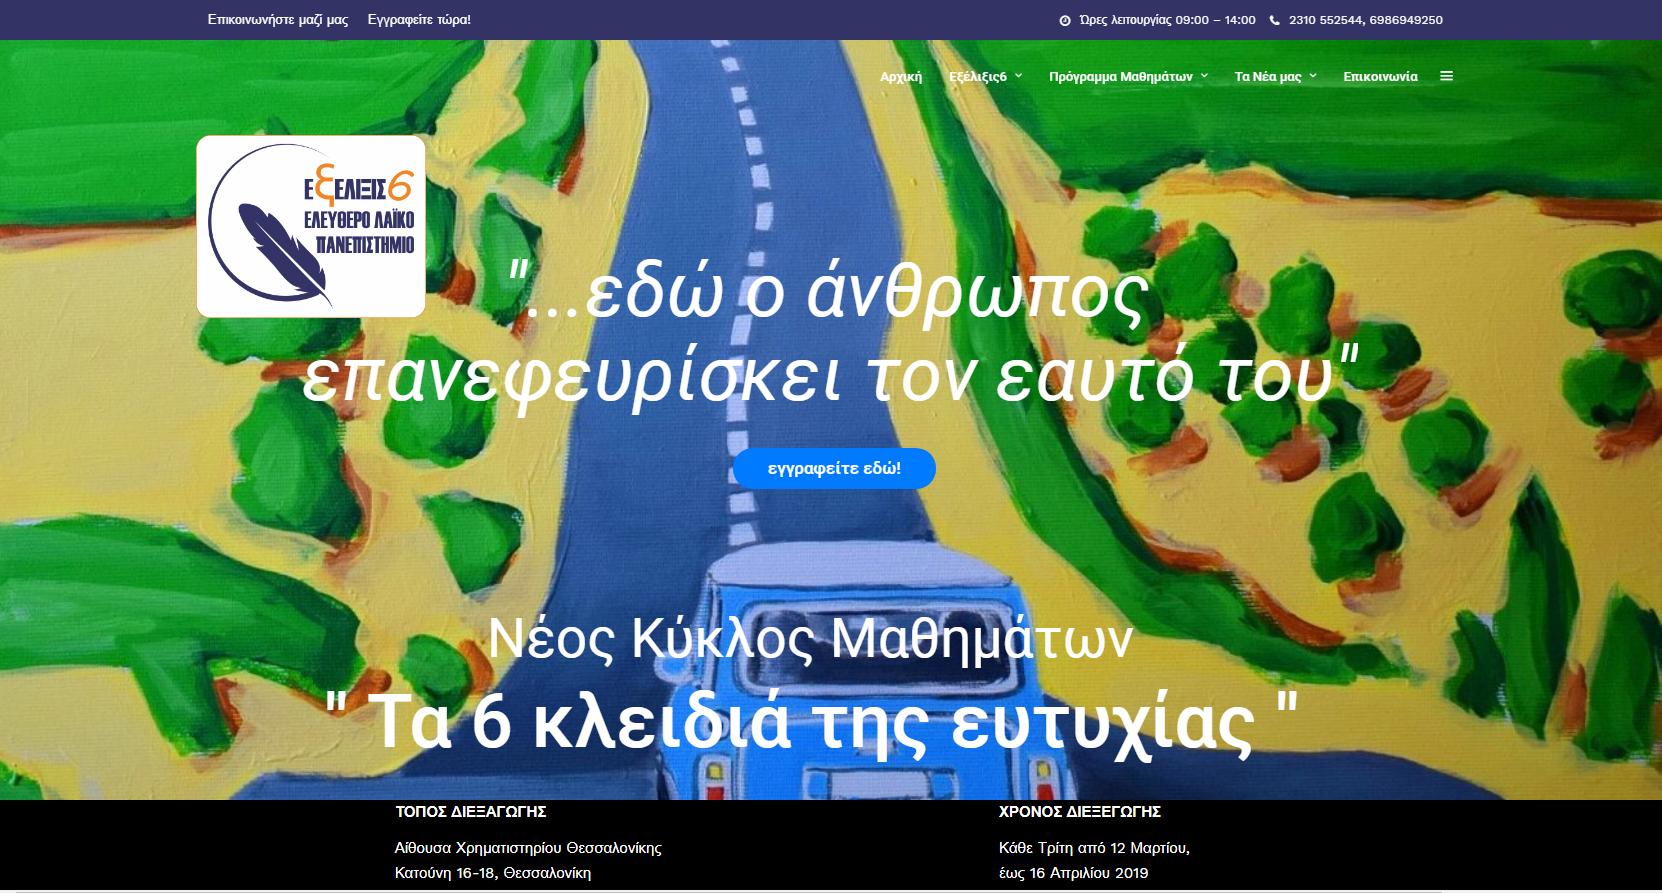 exelixis6.gr – Νέα Ιστοσελίδα στο χώρο της δια βίου μάθησης από τη VisionCA